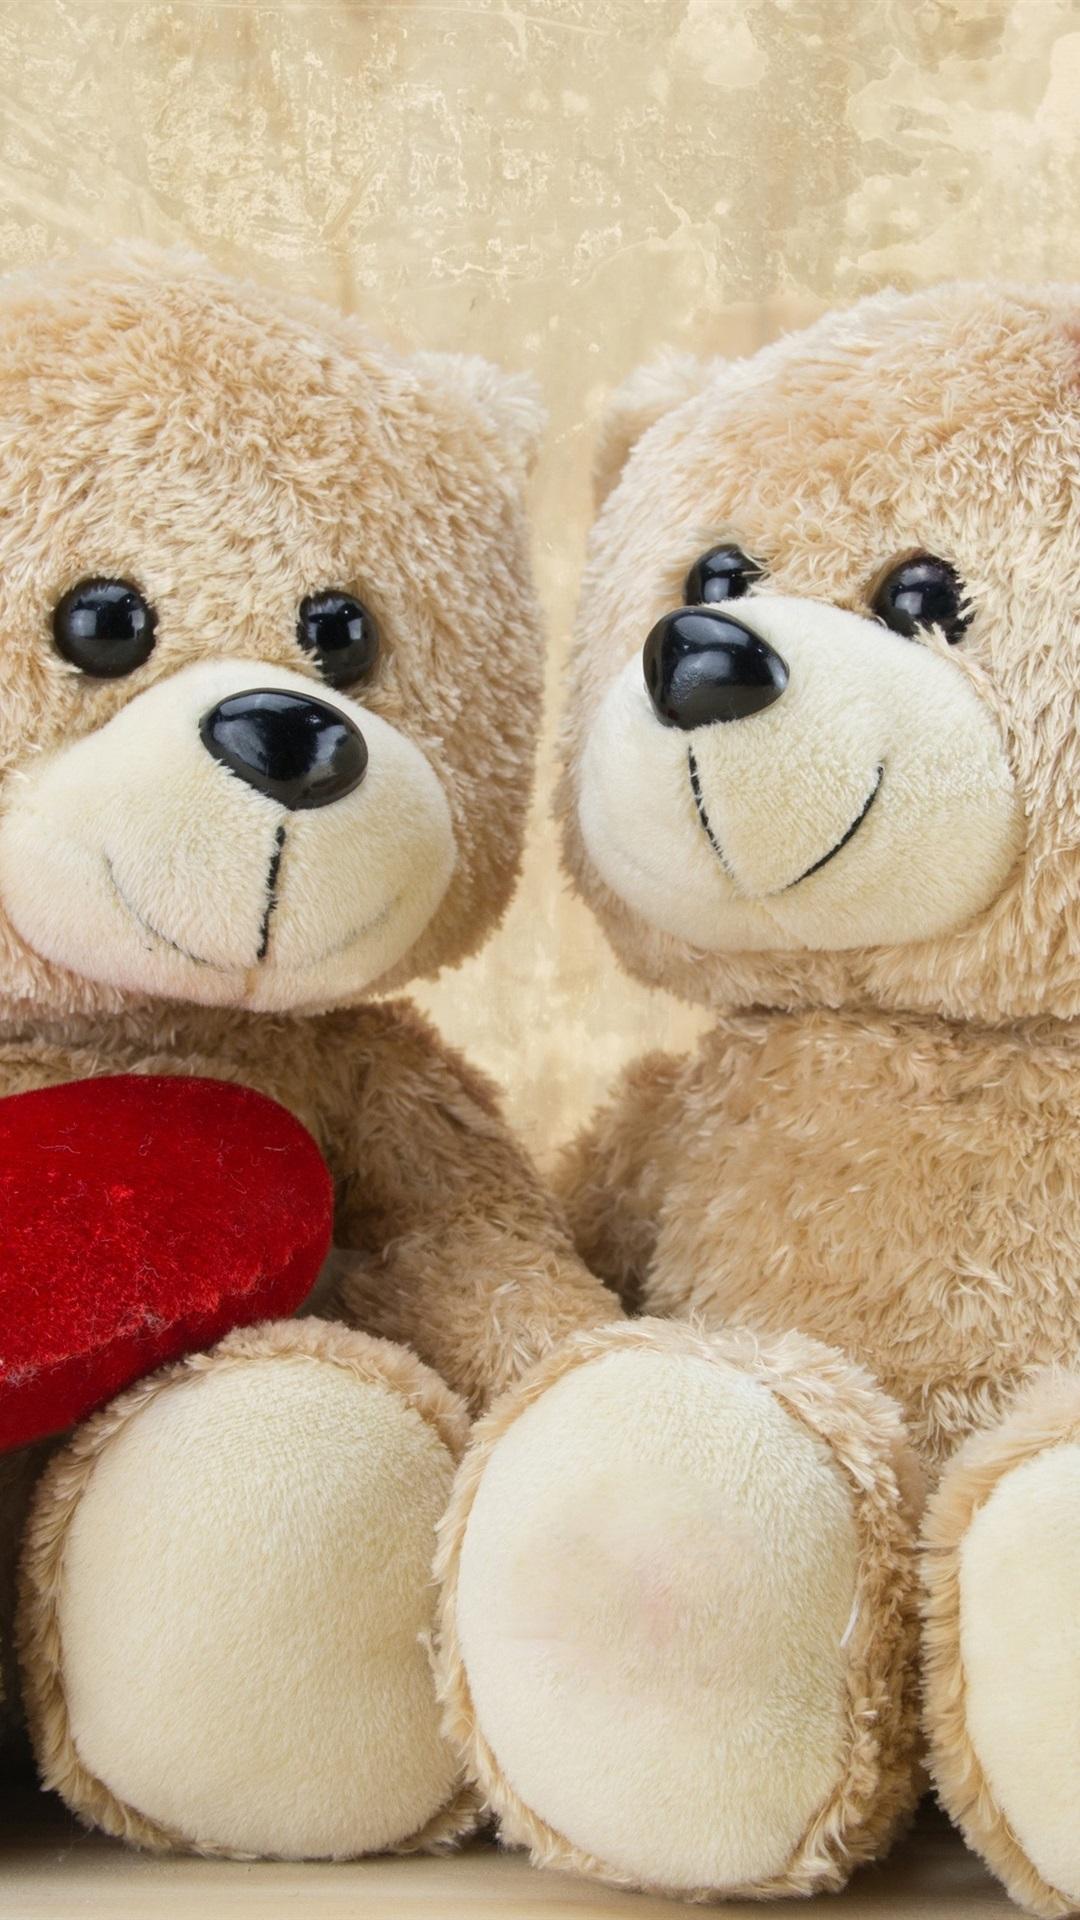 Teddy Bears Romantic Love Heart 1080x1920 Iphone 8 7 6 6s Plus